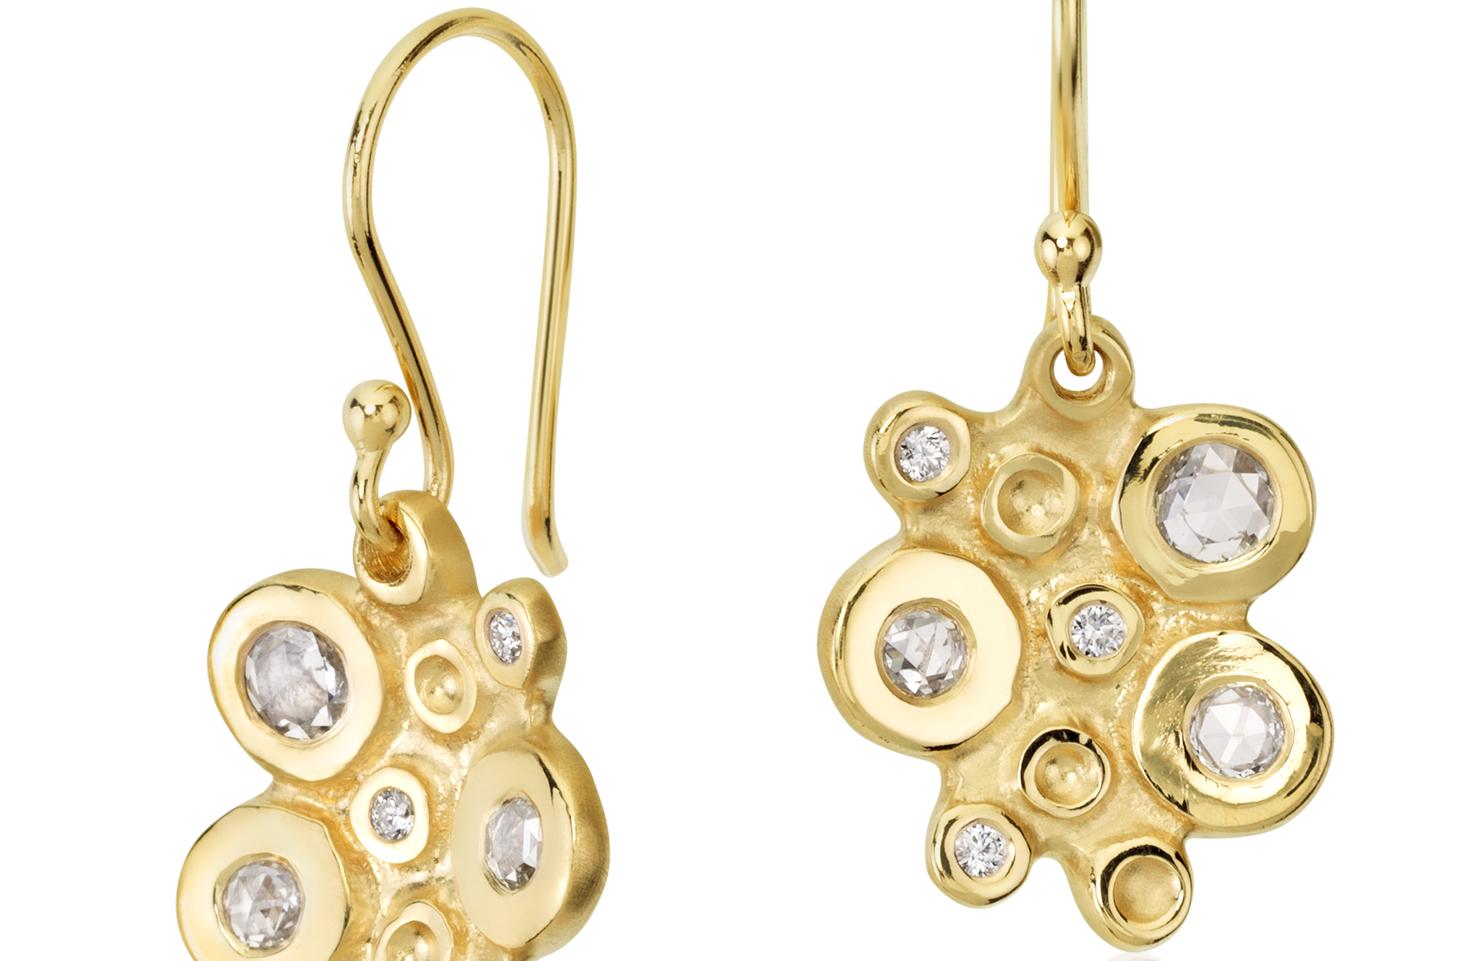 Aretes colgantes con racimo de diamante en forma de burbuja de Anne Sportun en oro amarillo de 18k